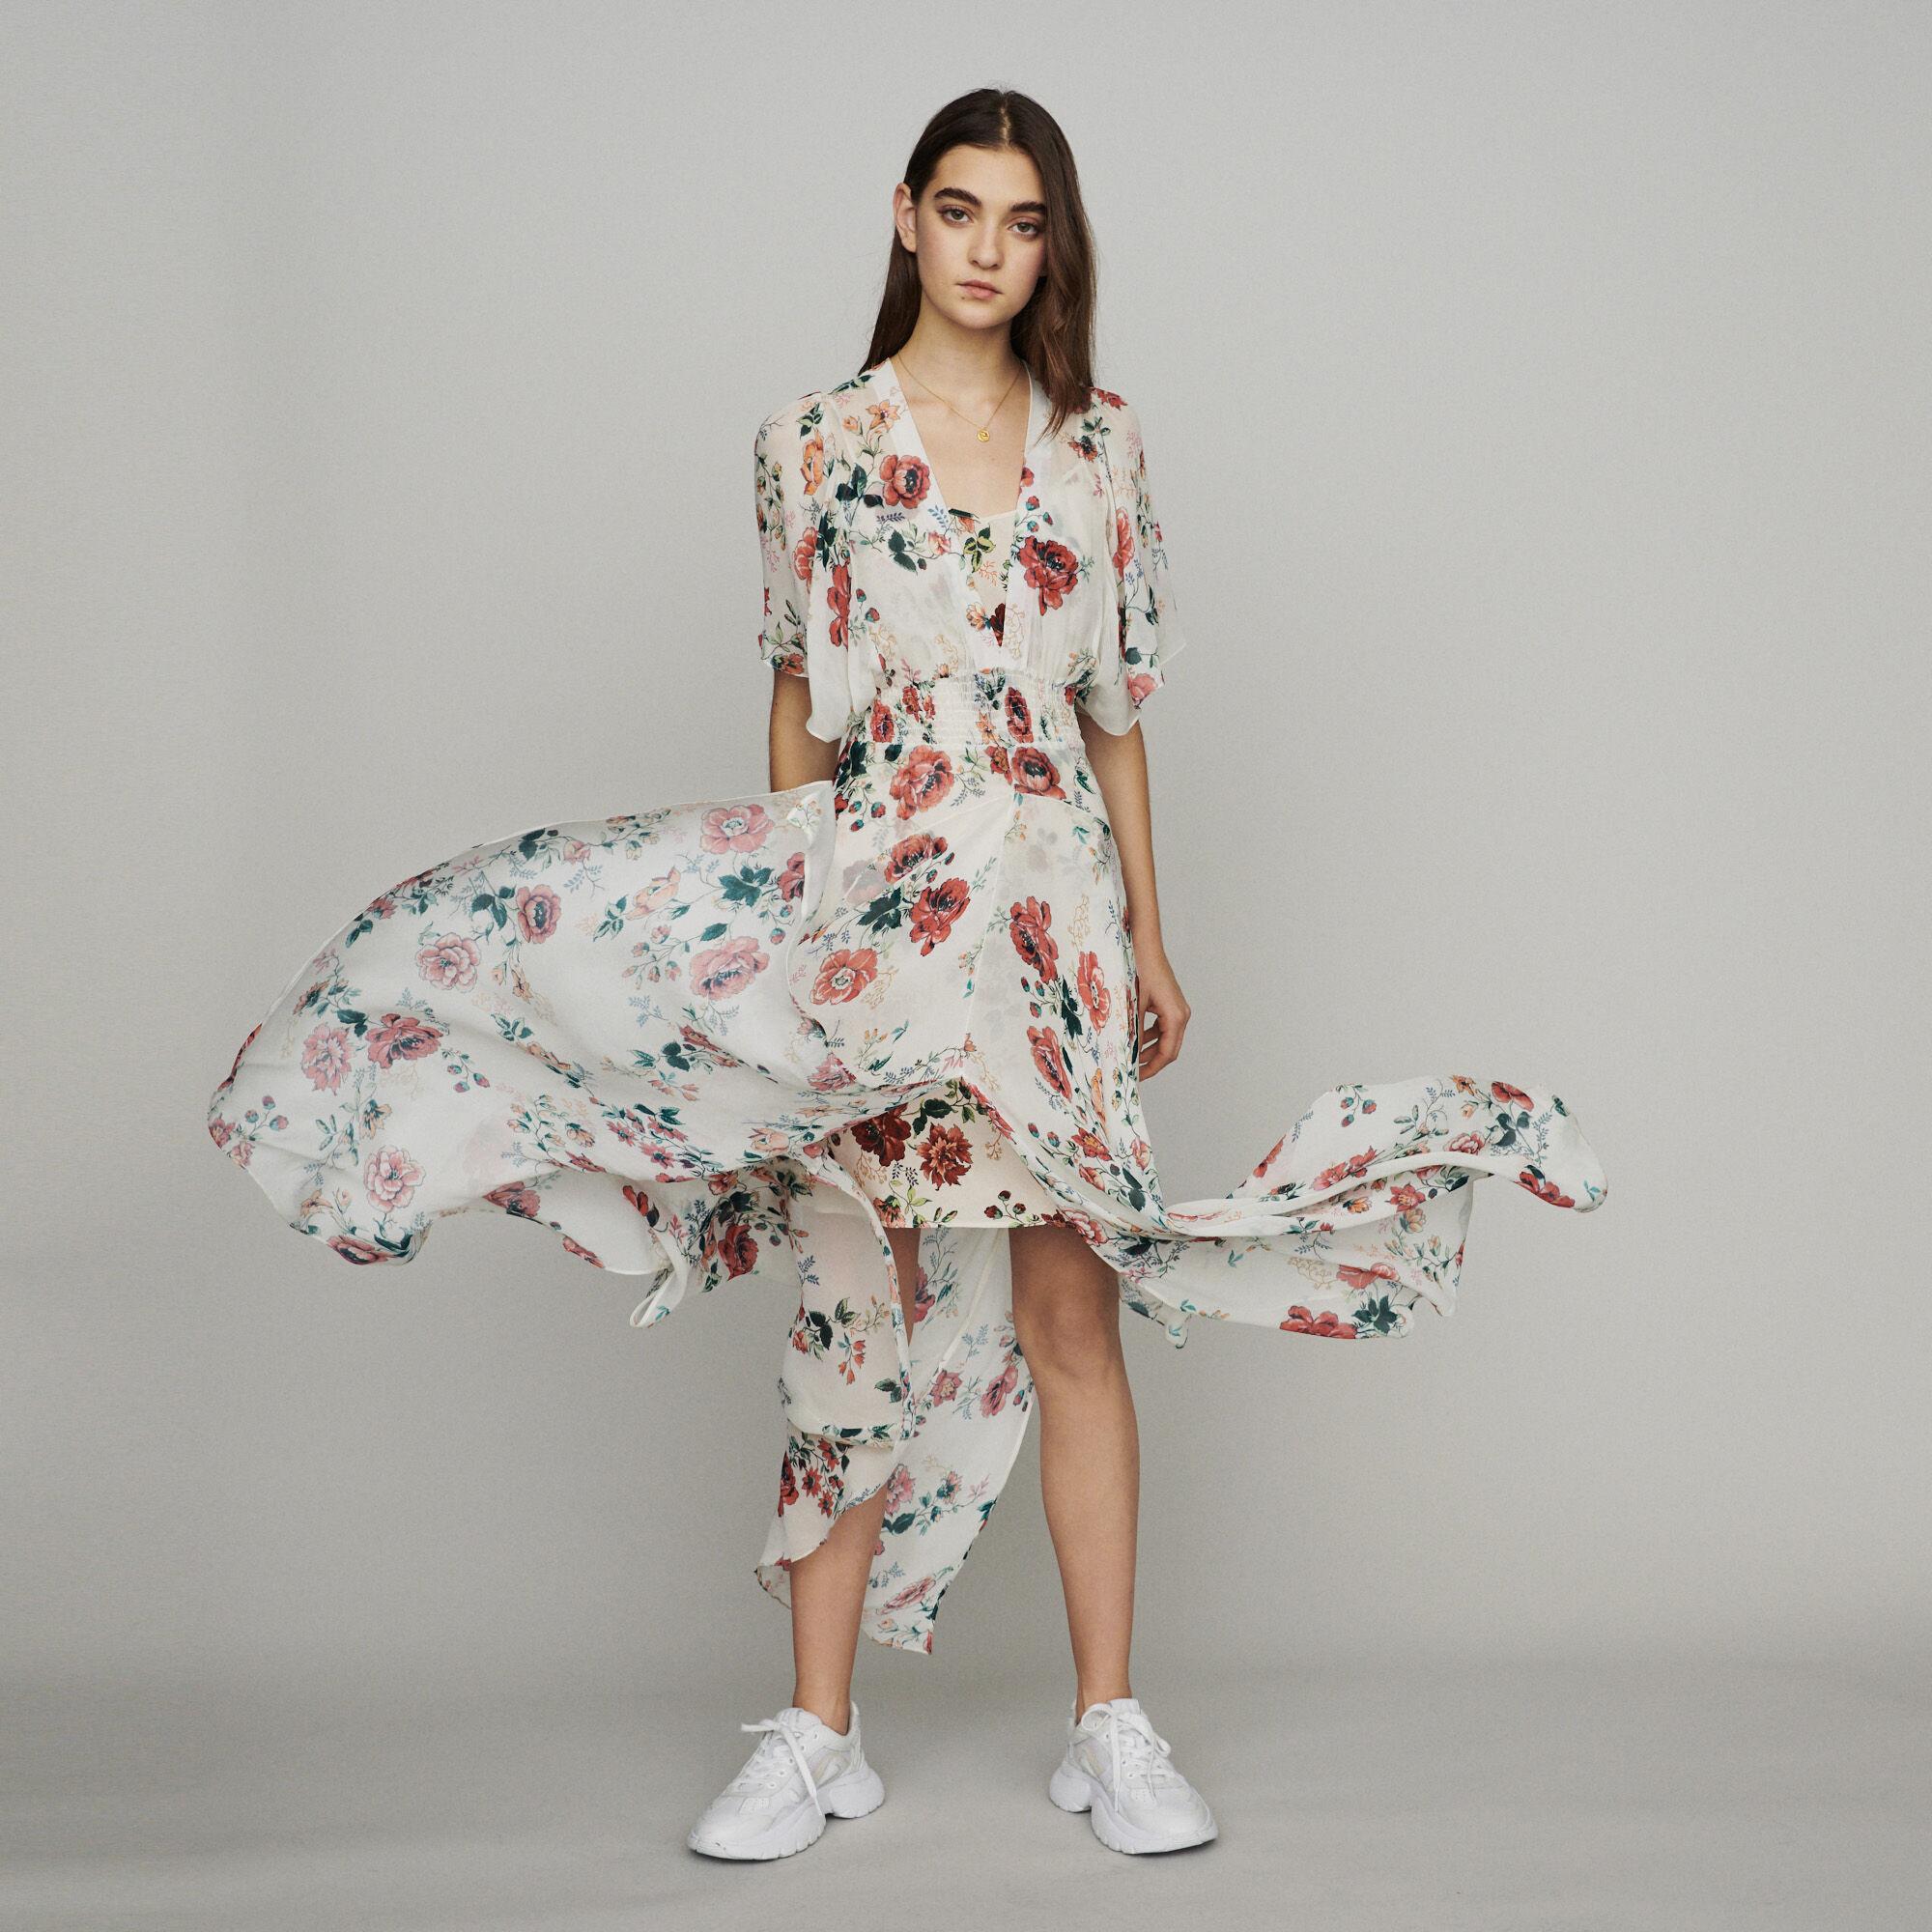 Ready to Wear Dresses